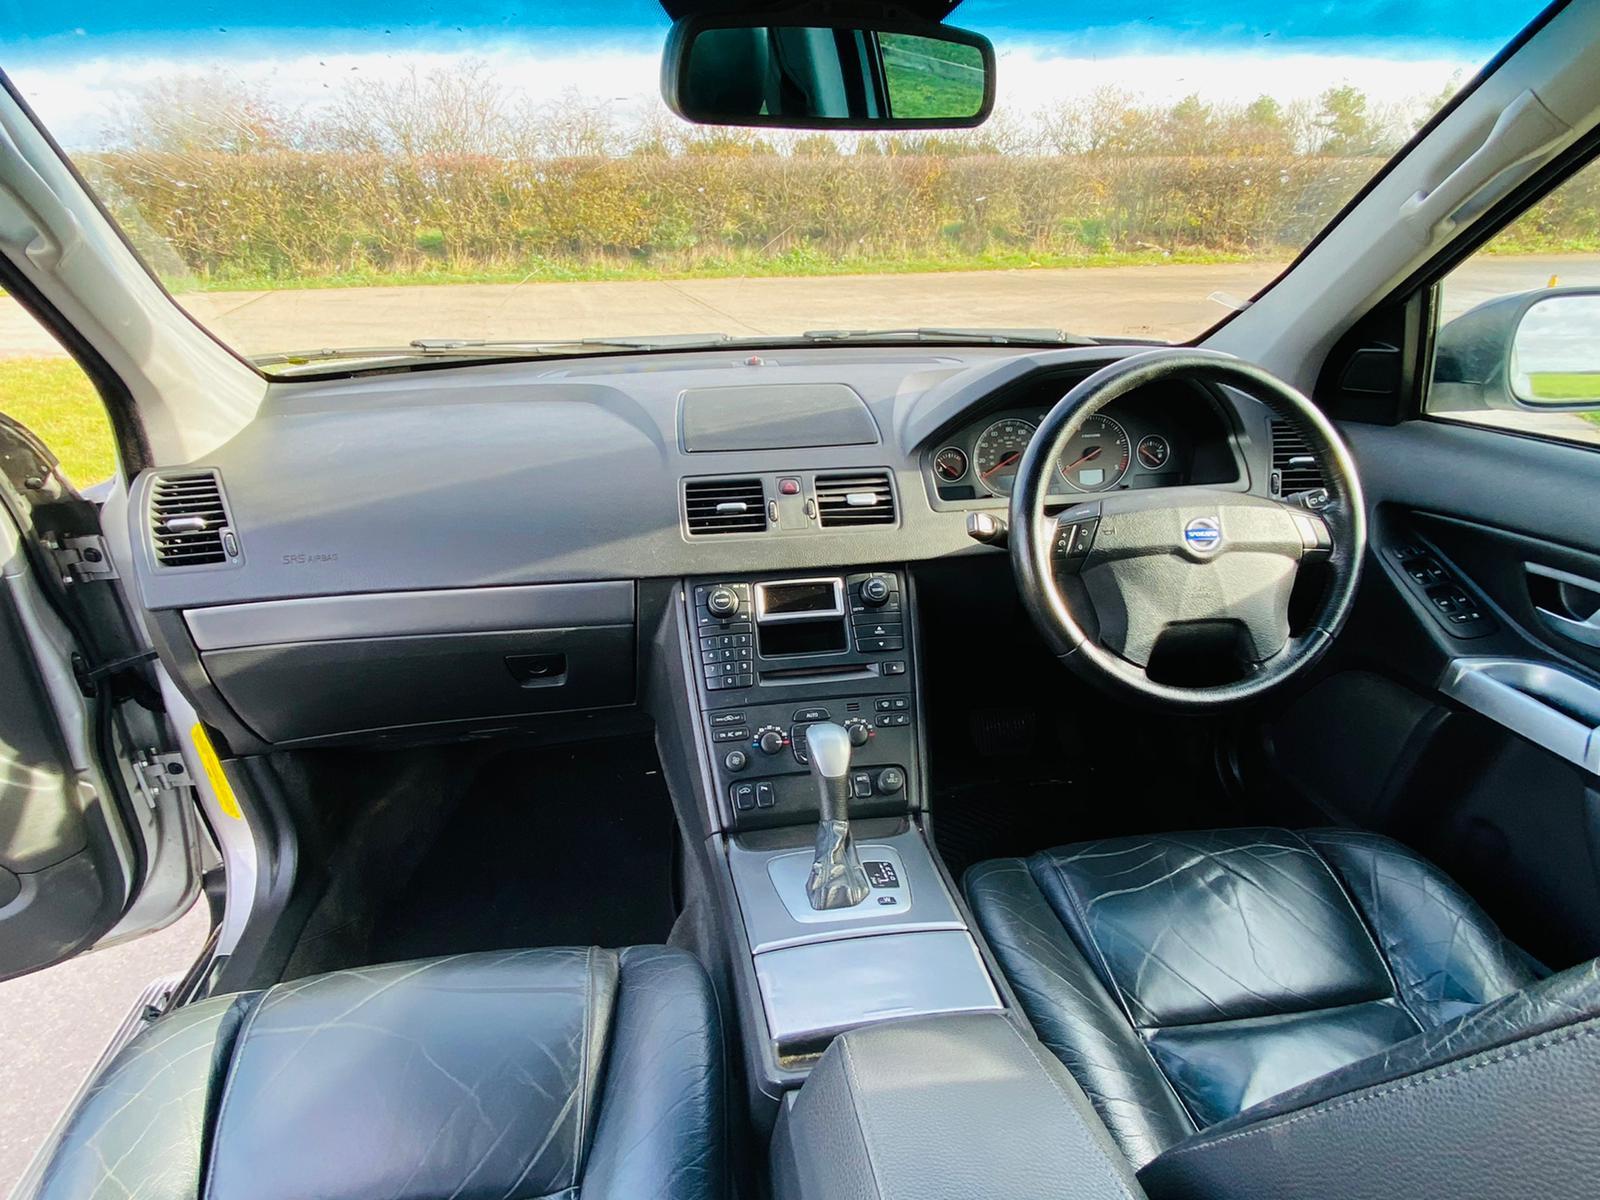 Volvo XC90 2.4 D5 185bhp SE Geartronic Auto 2006 06 Reg - 7 Seats - Air con - Top Spec - Image 37 of 47